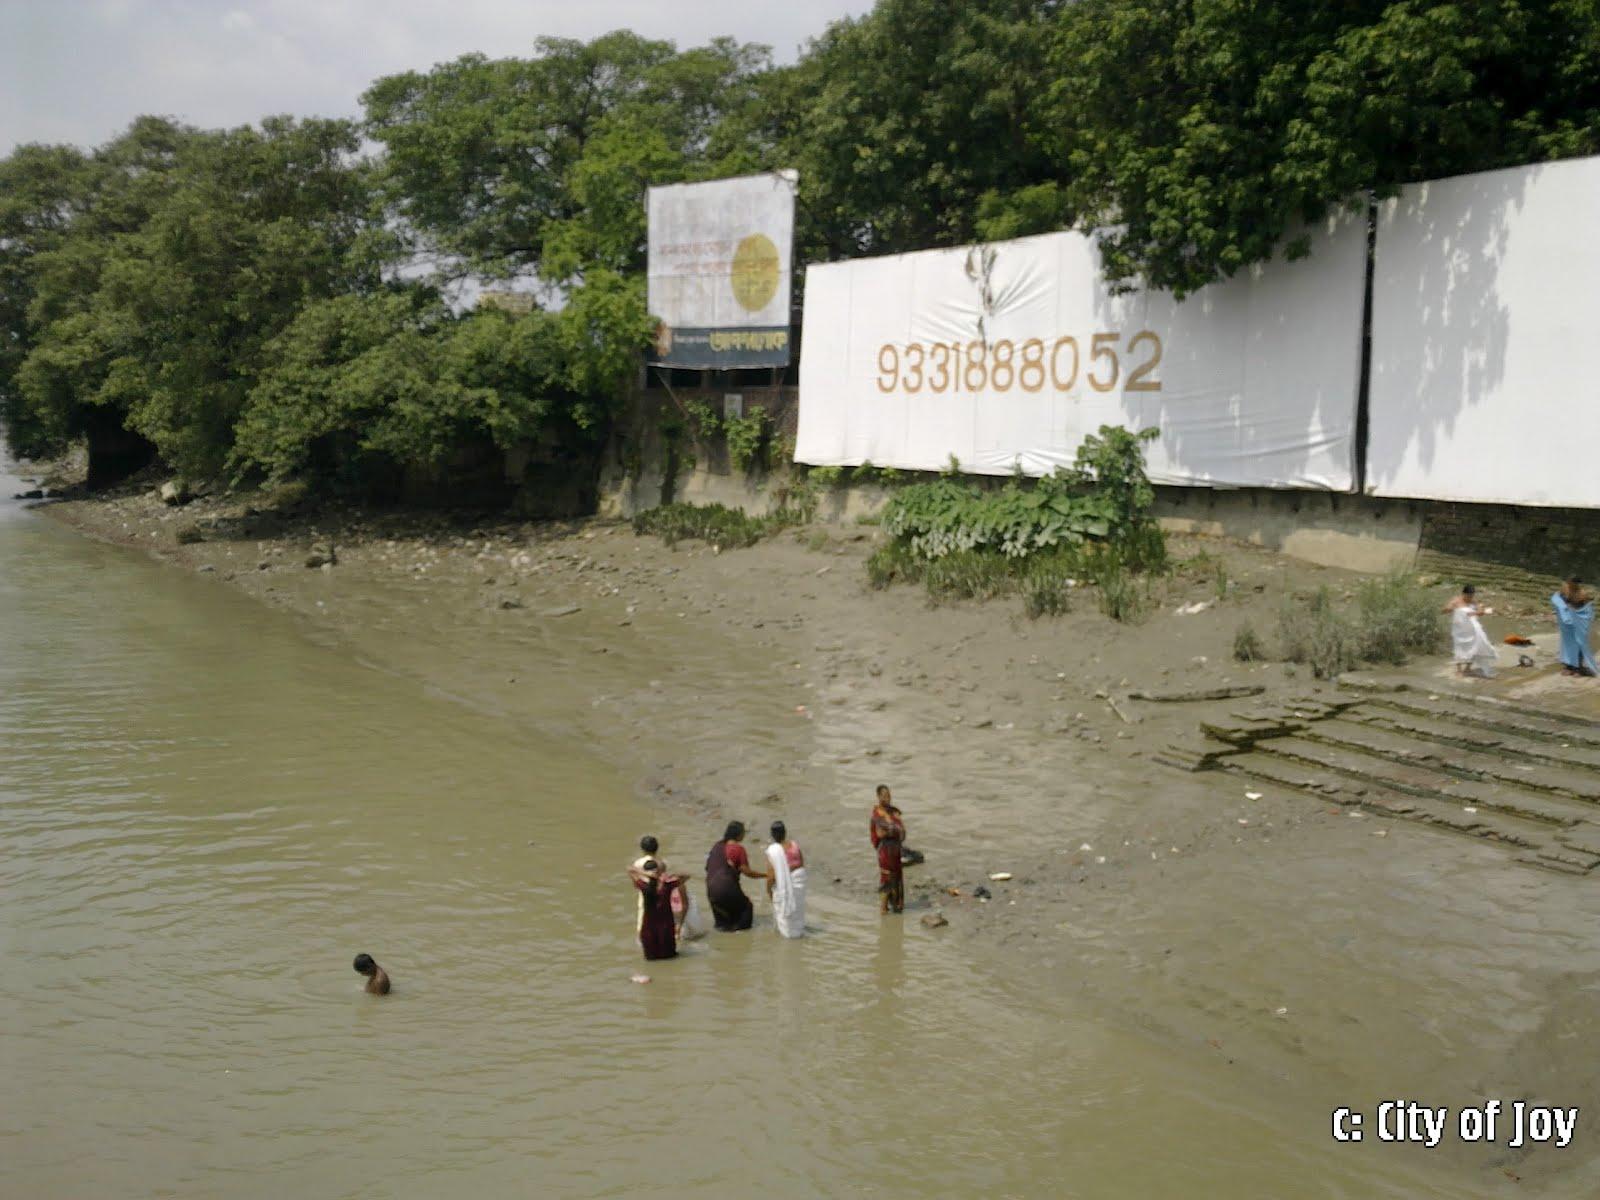 KOLKATA BLOG: Bathing On River Ganga